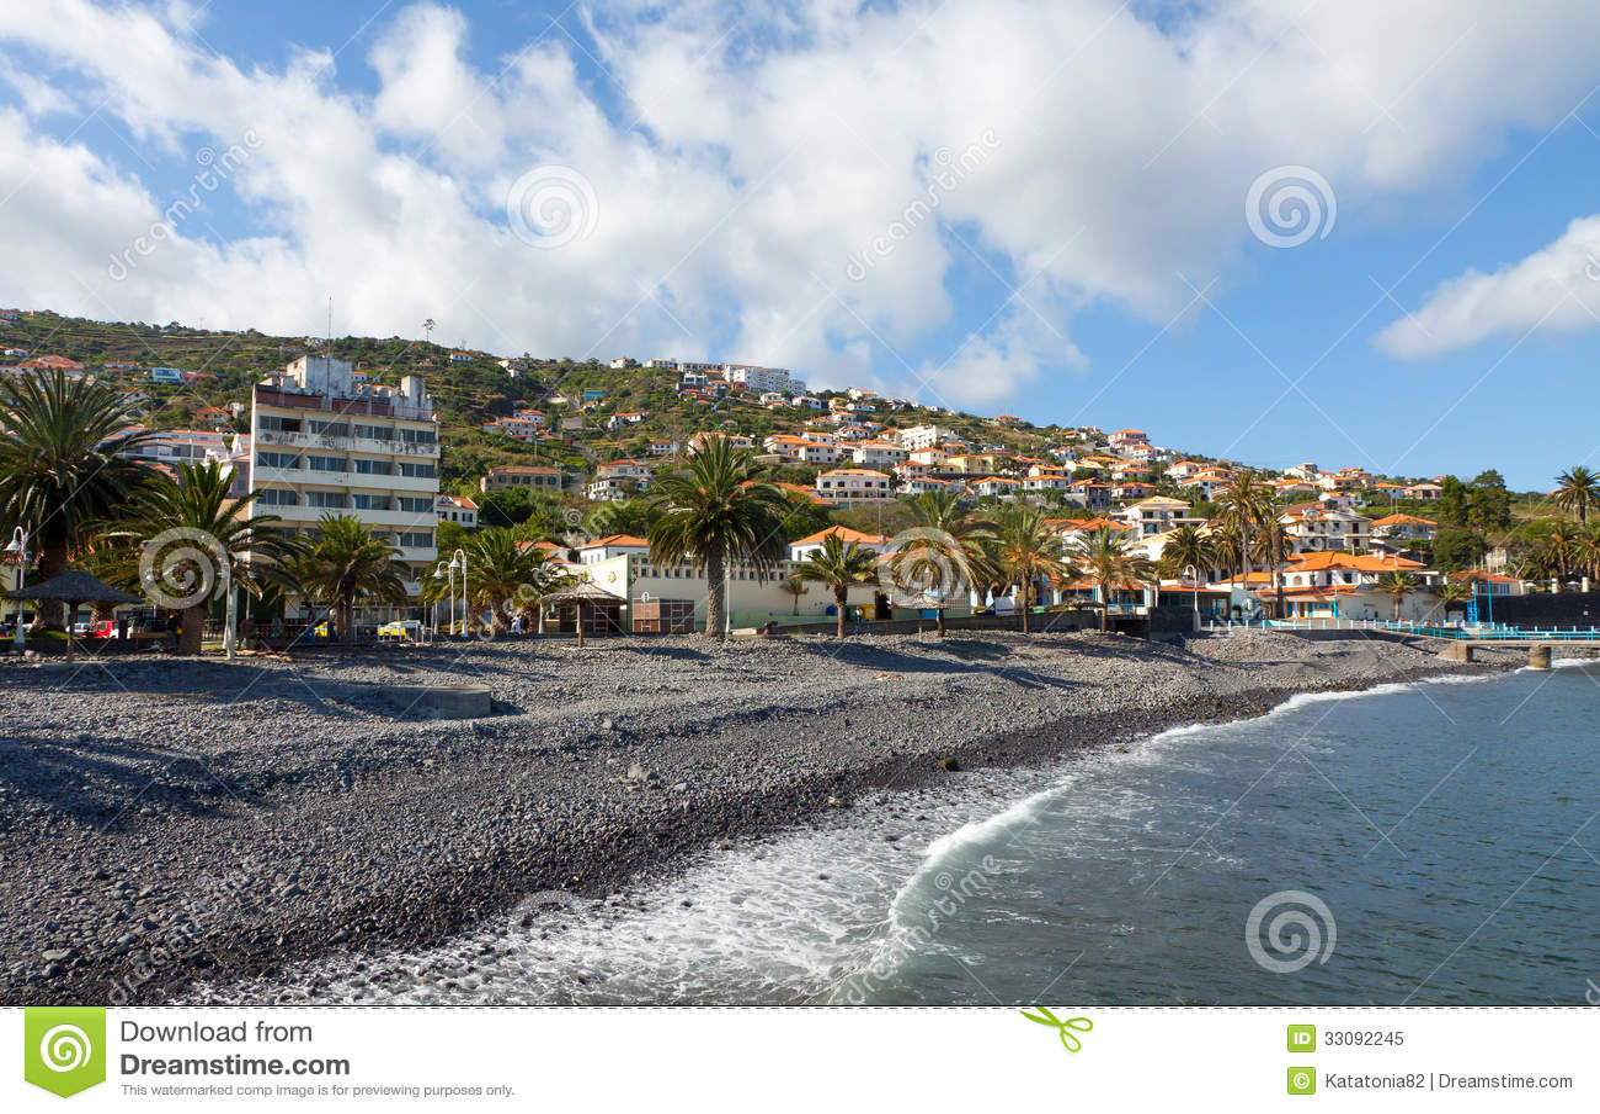 Beach In Santa Cruz Madeira Island Portugal Royalty Free